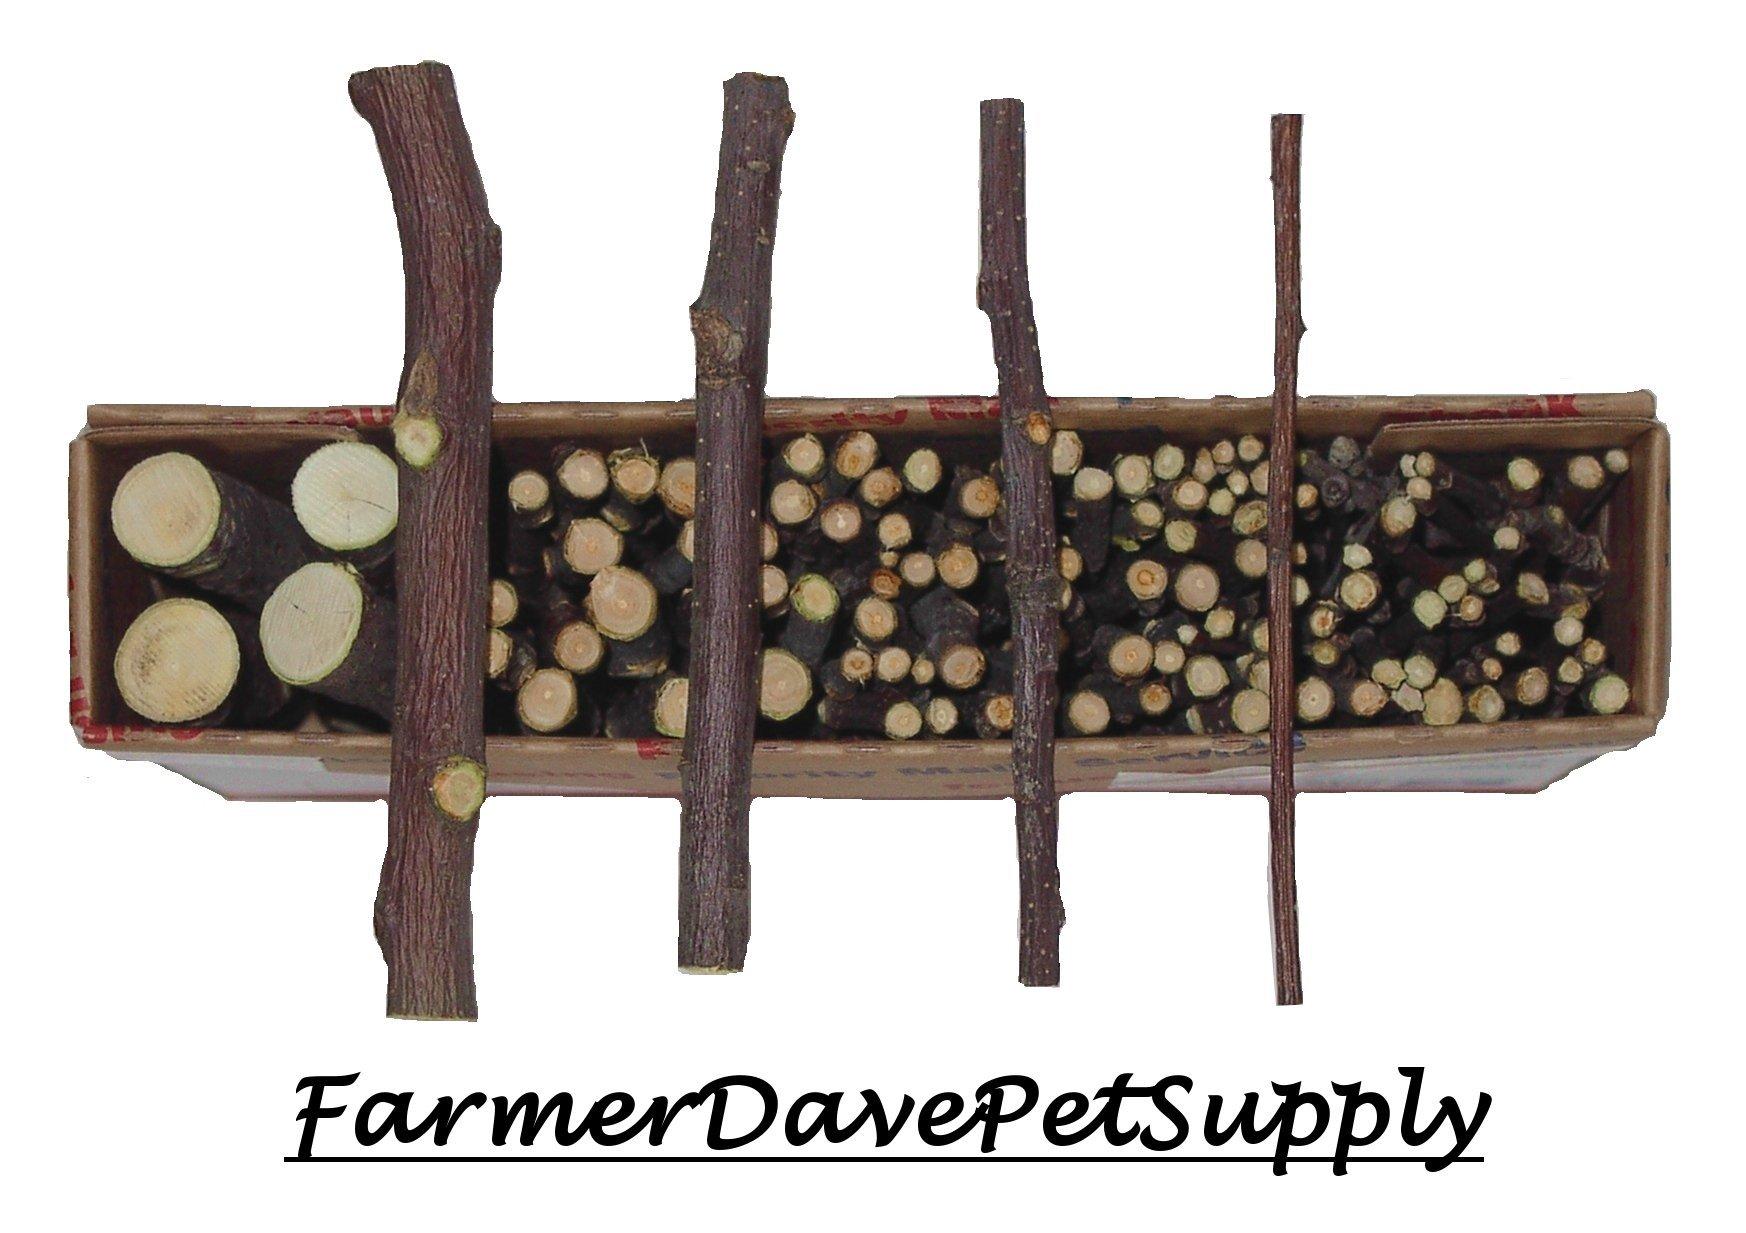 FarmerDavePetSupply 120 MIXED APPLE CHEW BONUS PACK FOR SMALL ANIMALS